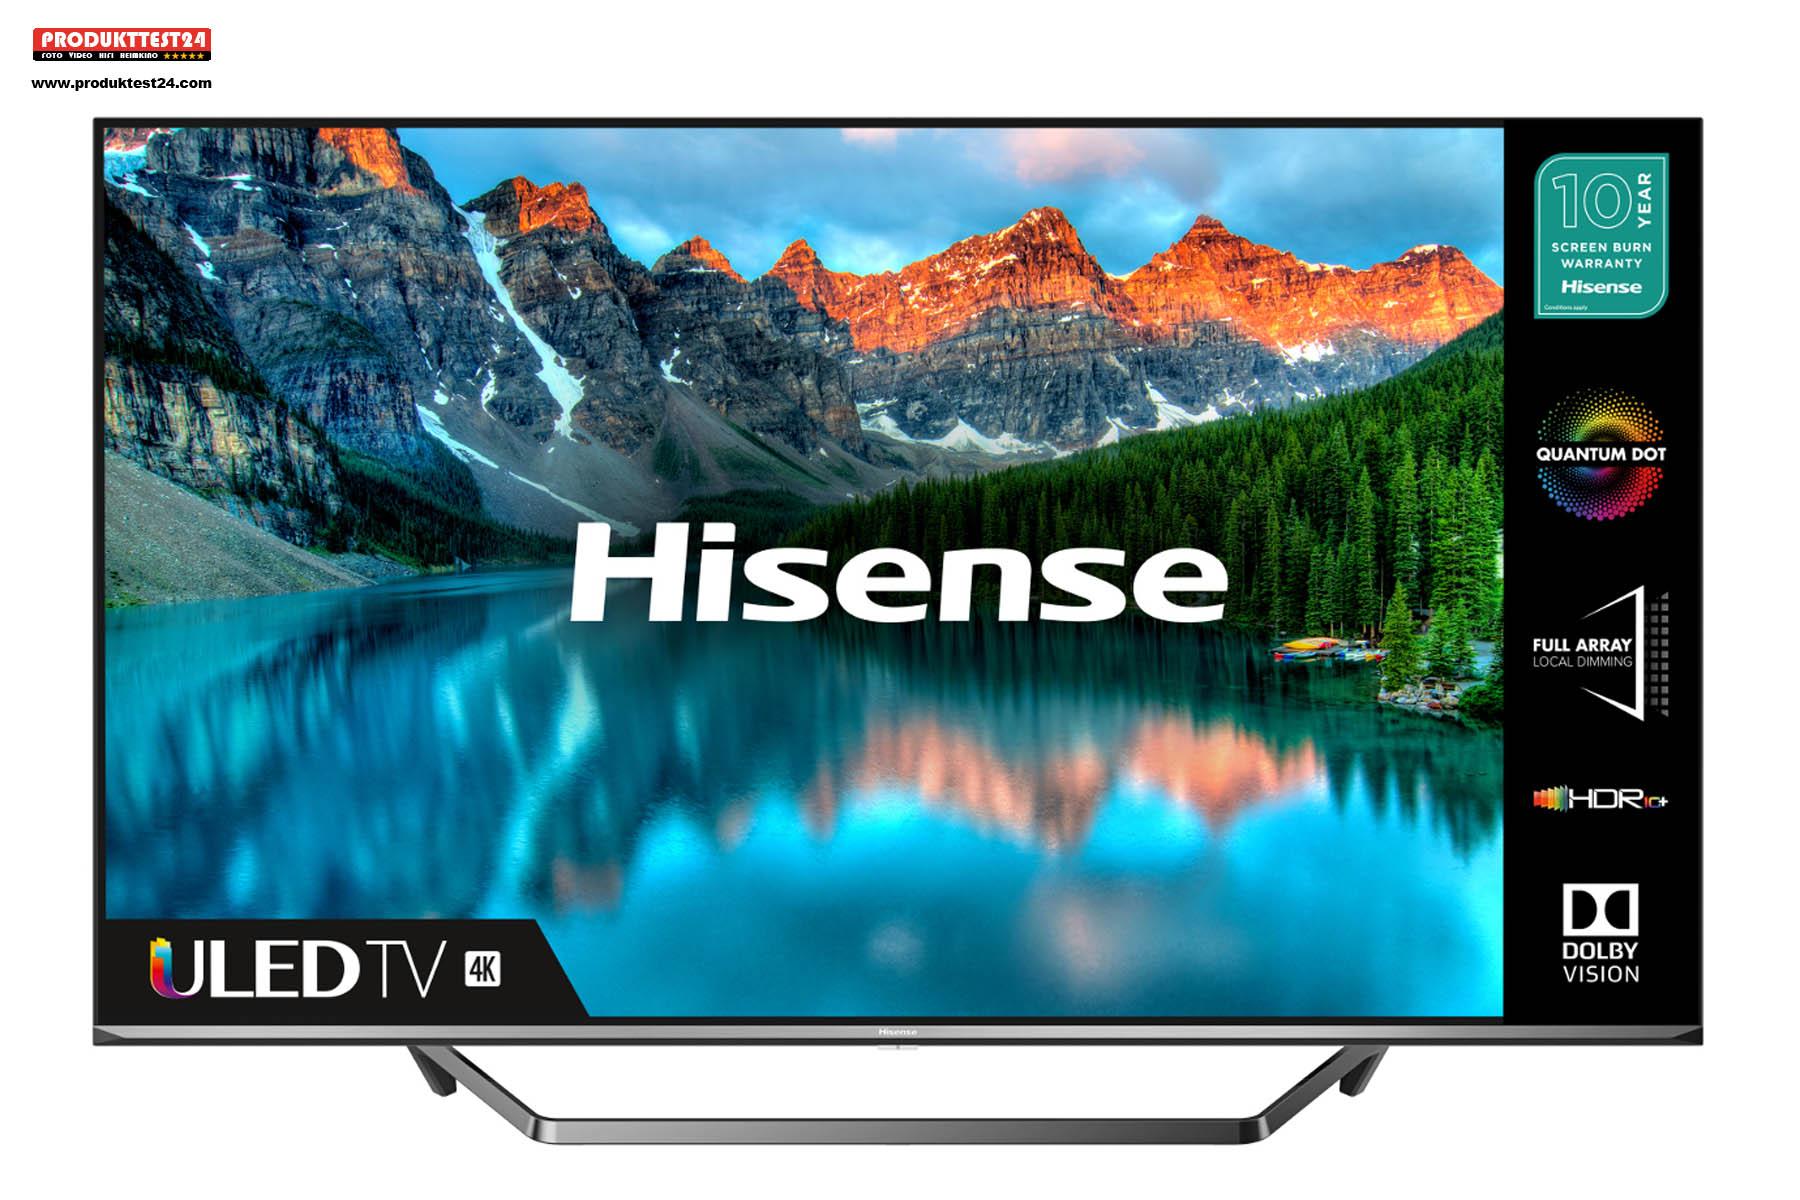 Hisense 65U7QF ULED 4K-TV mit Quantum Dot Technik